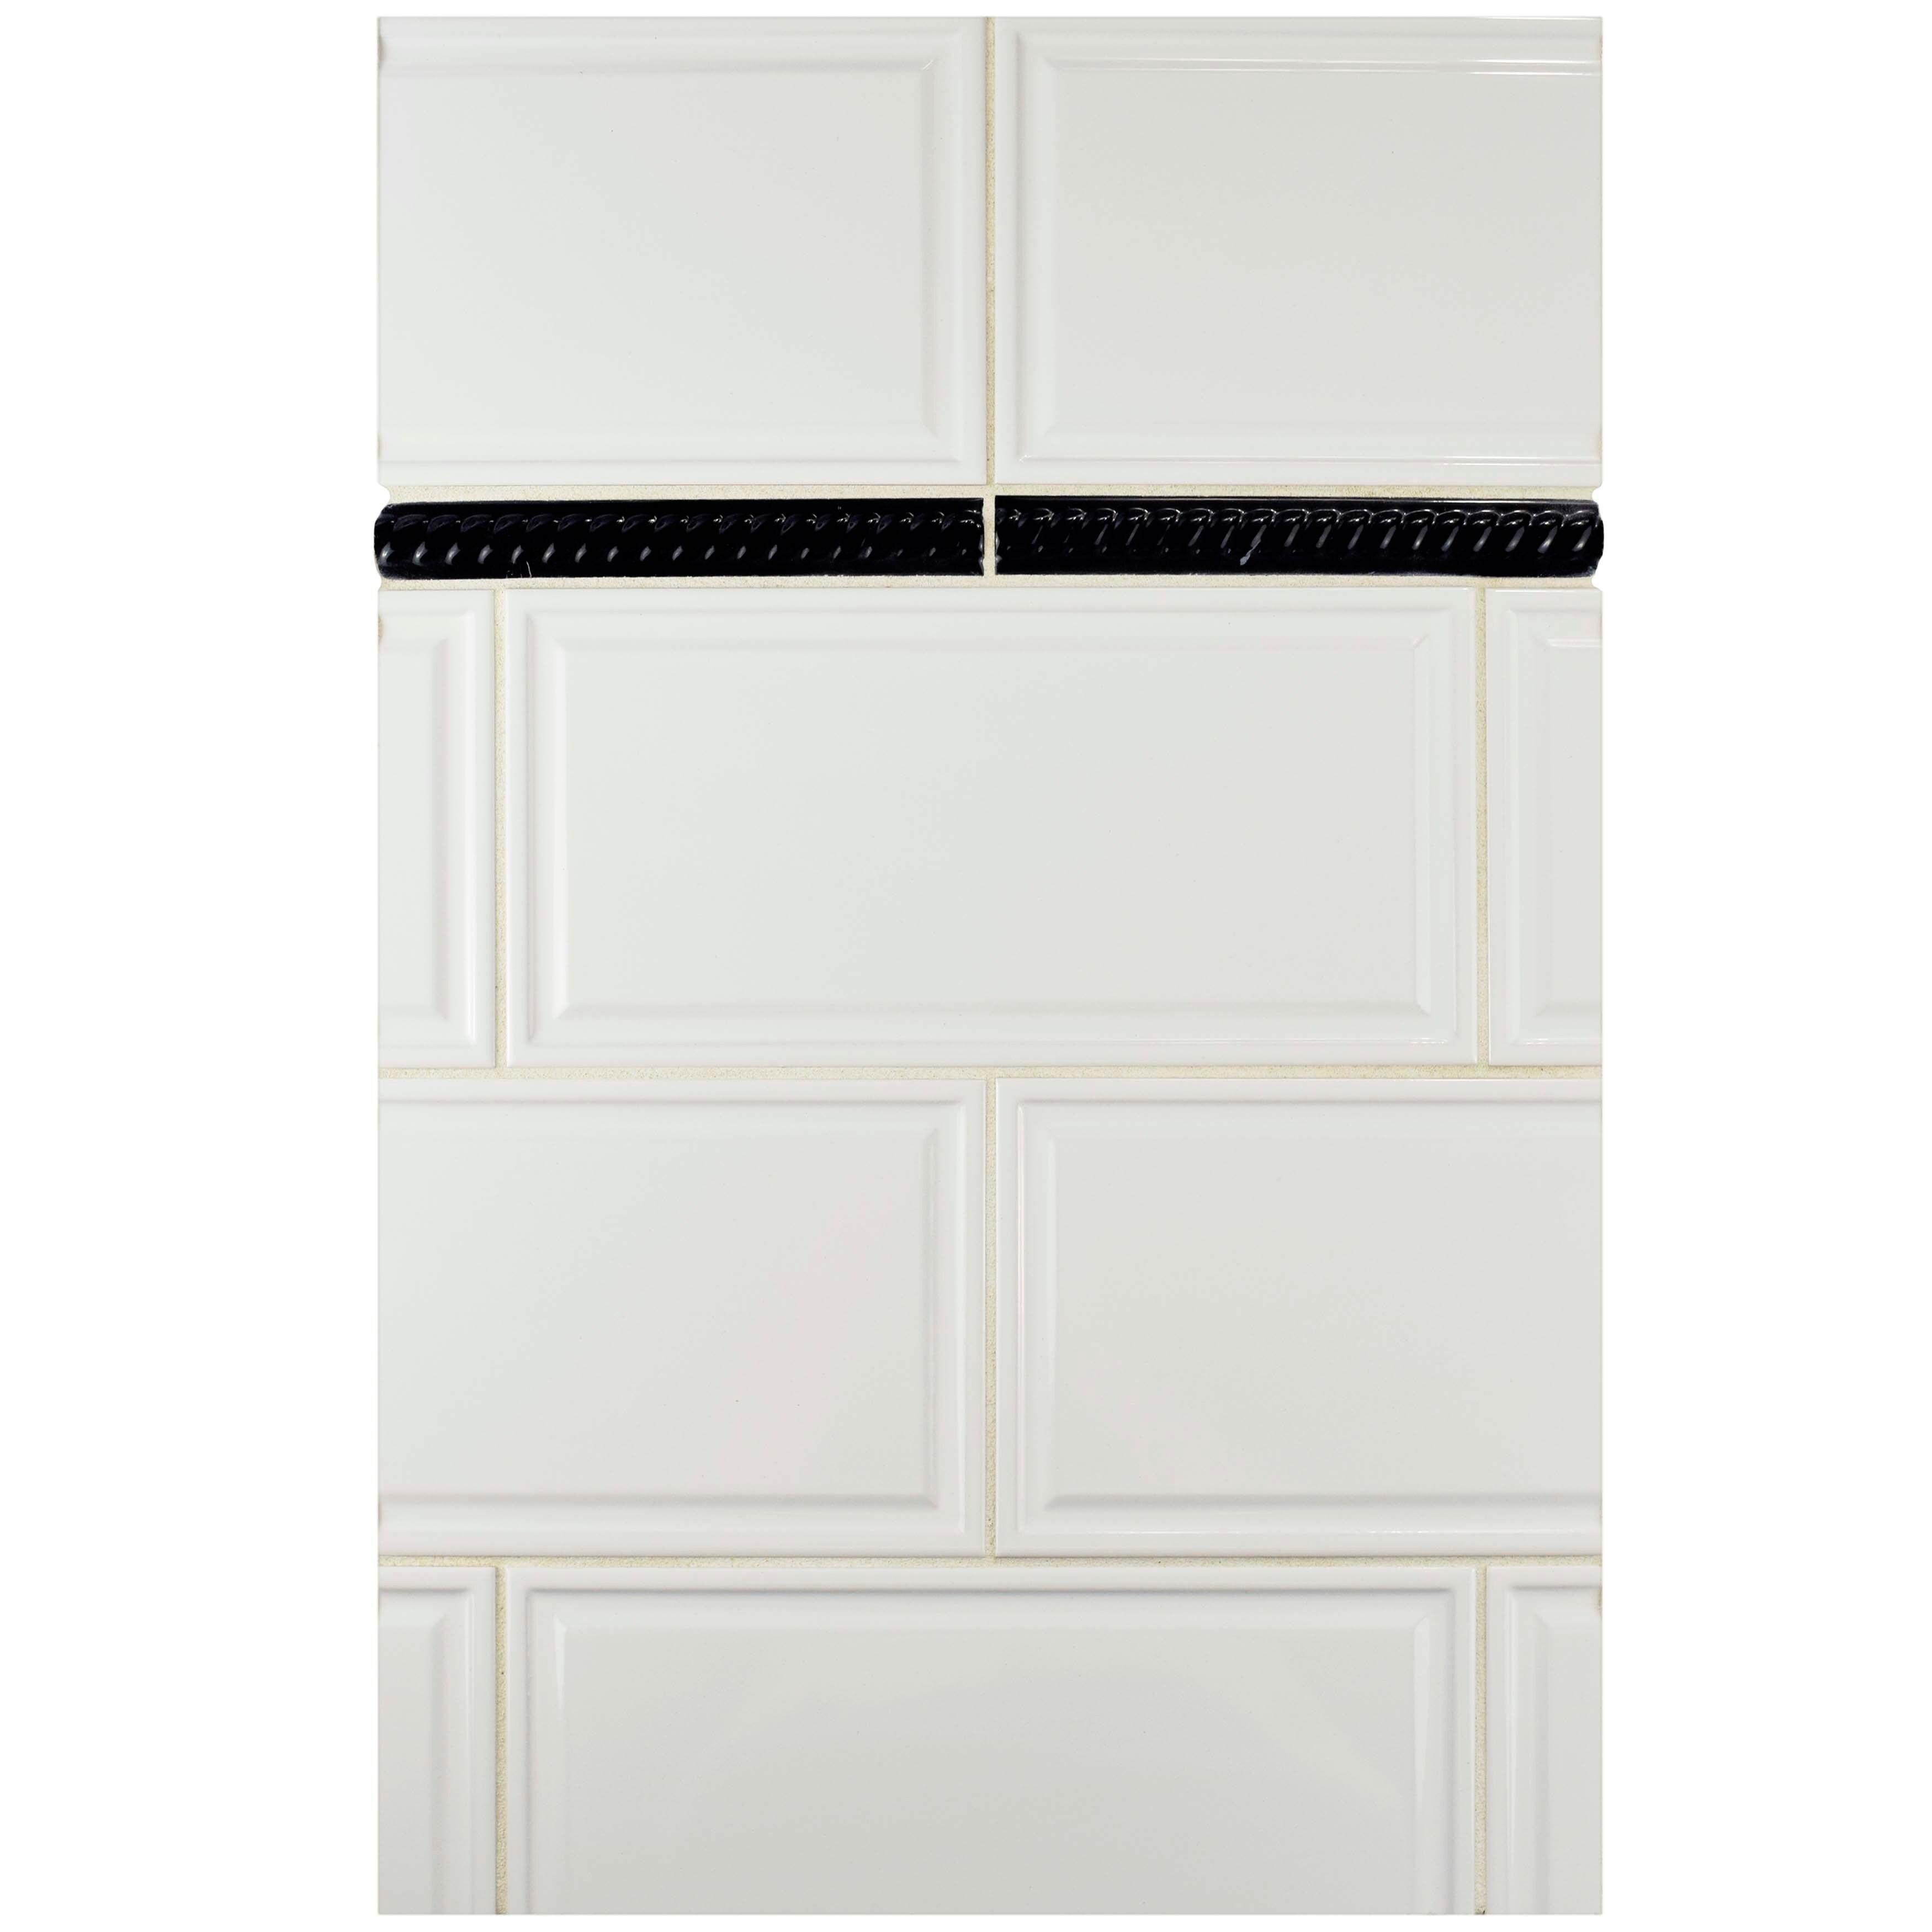 Somertile 6x12 inch dobladillo white ceramic wall tile case of 22 somertile 6x12 inch dobladillo white ceramic wall tile case of 22 free shipping today overstock 18037114 dailygadgetfo Choice Image